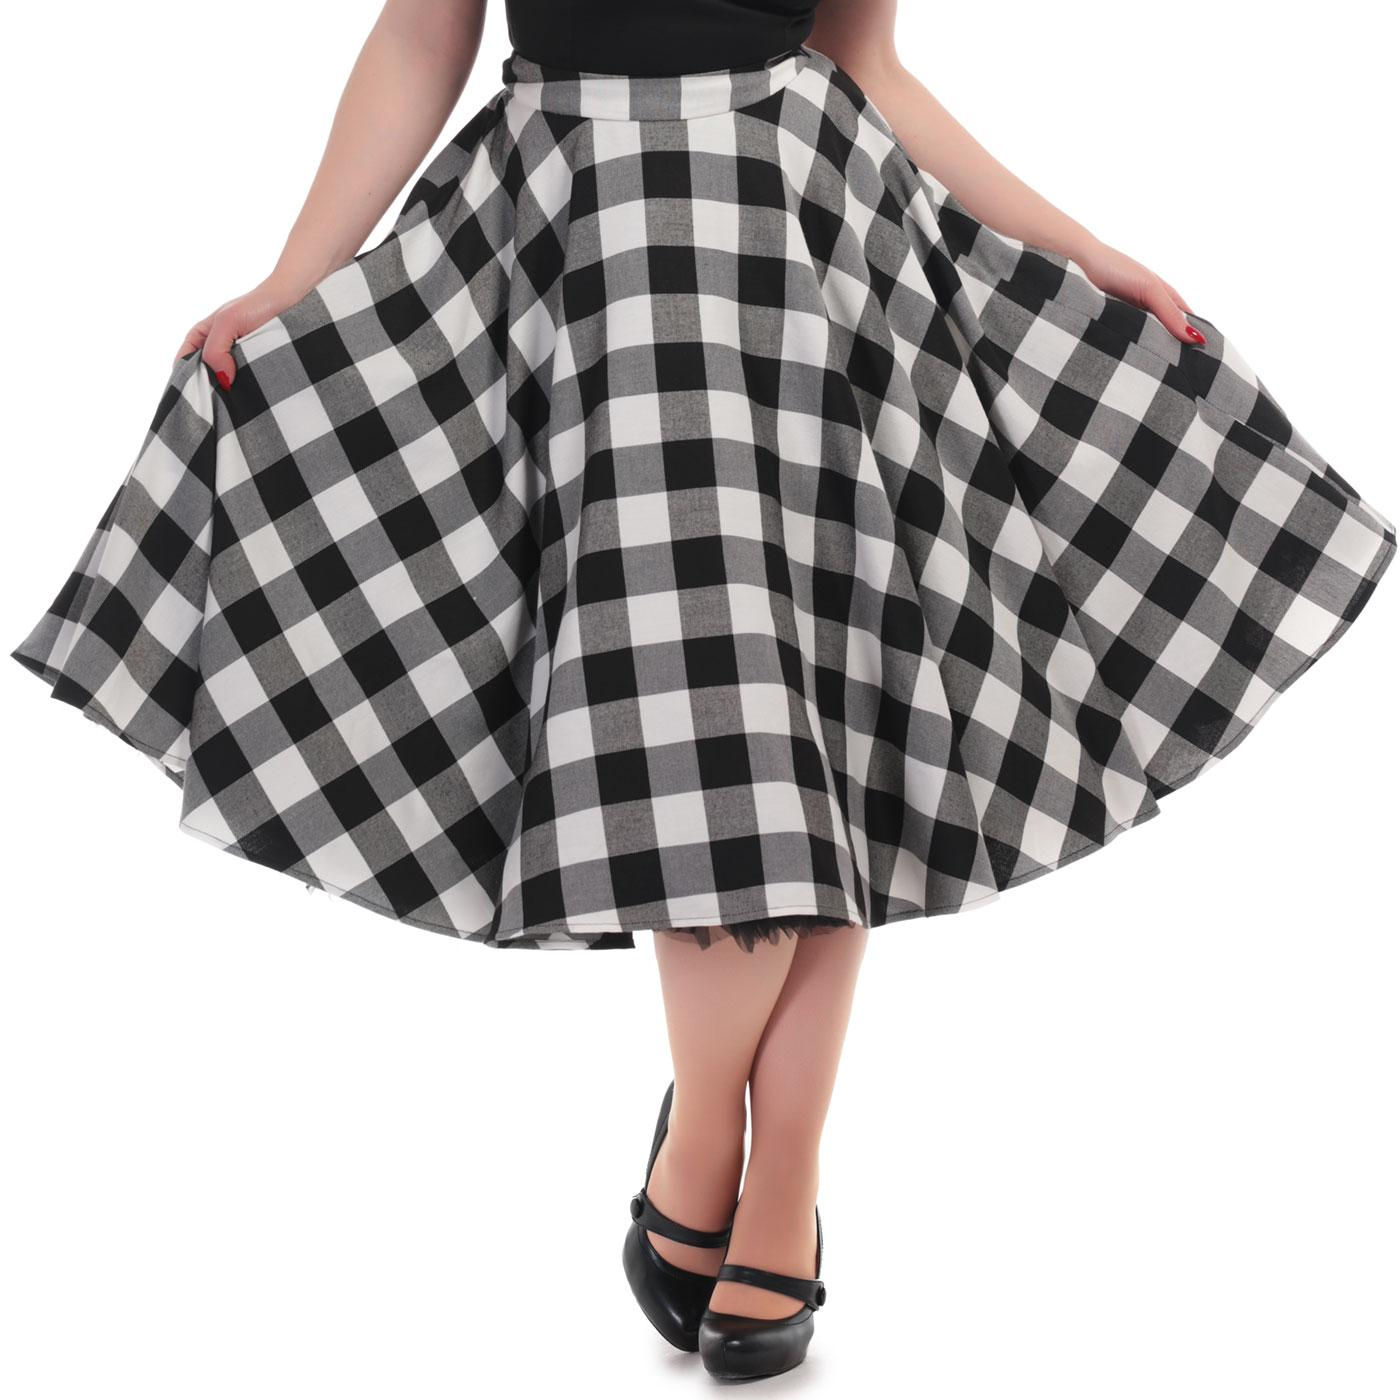 Milla COLLECTIF Retro 50s Gingham Swing Skirt